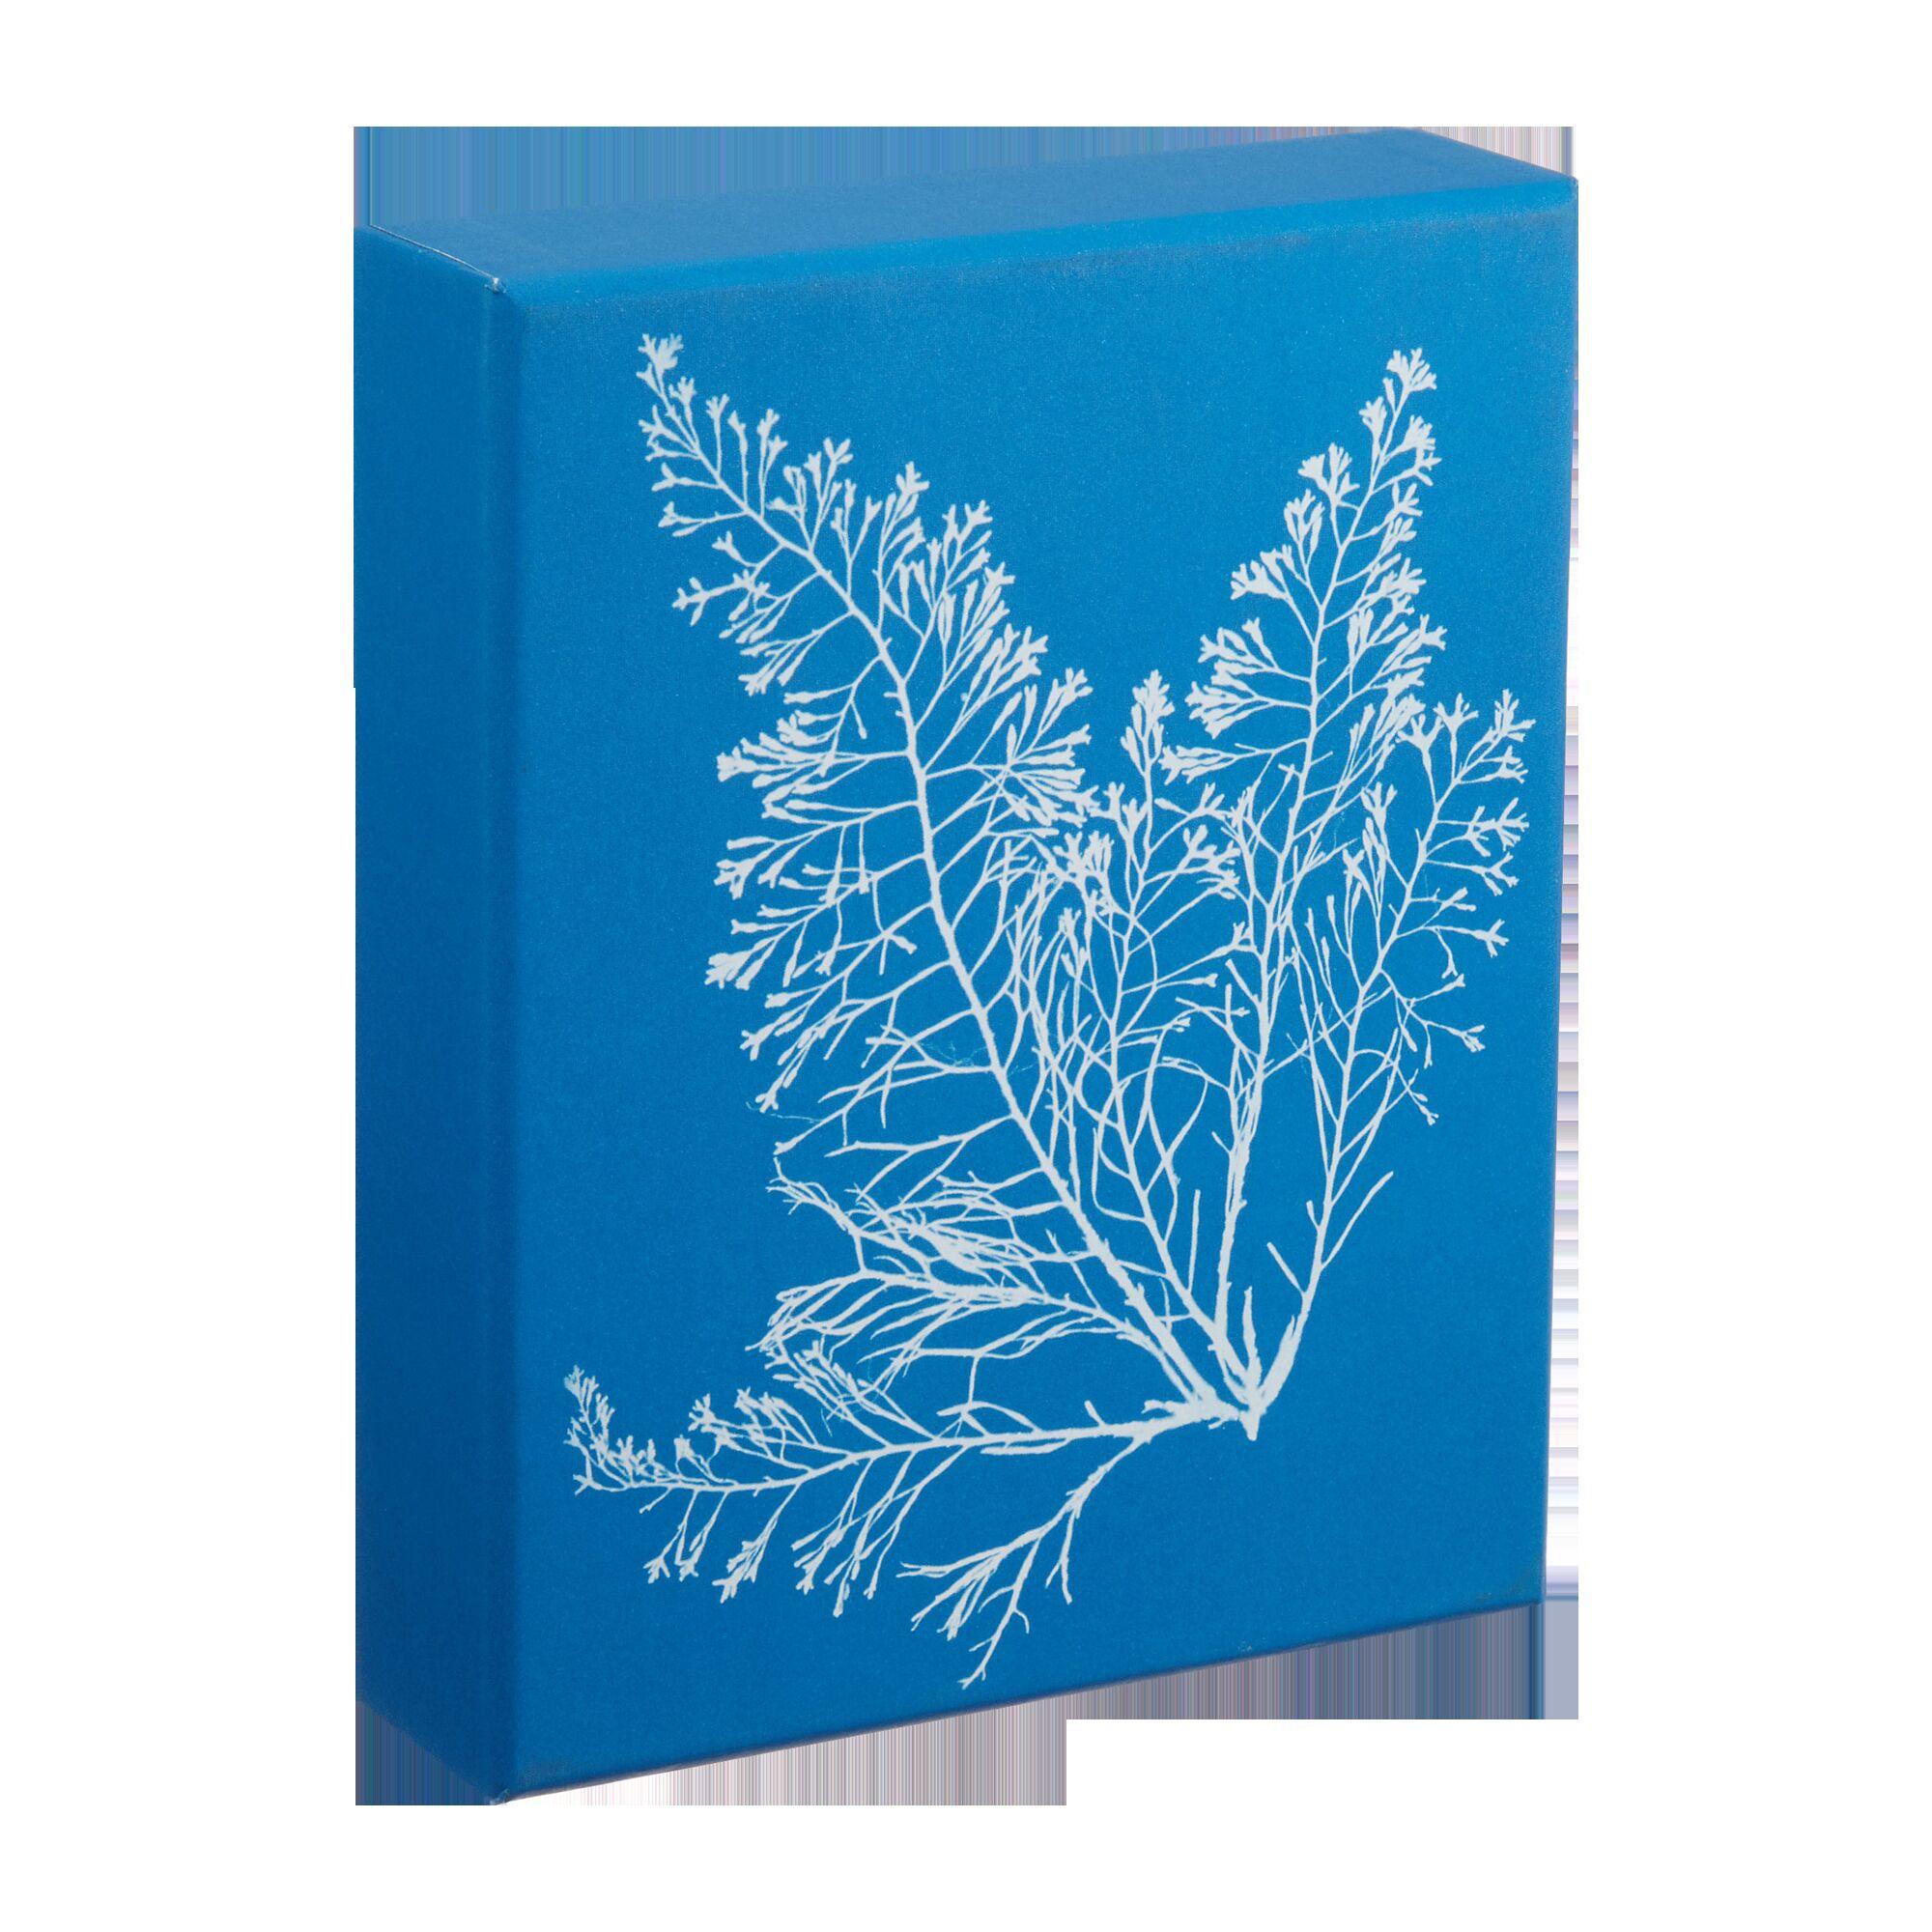 Sunprint Notecards: The Cyanotypes of Anna Atkins